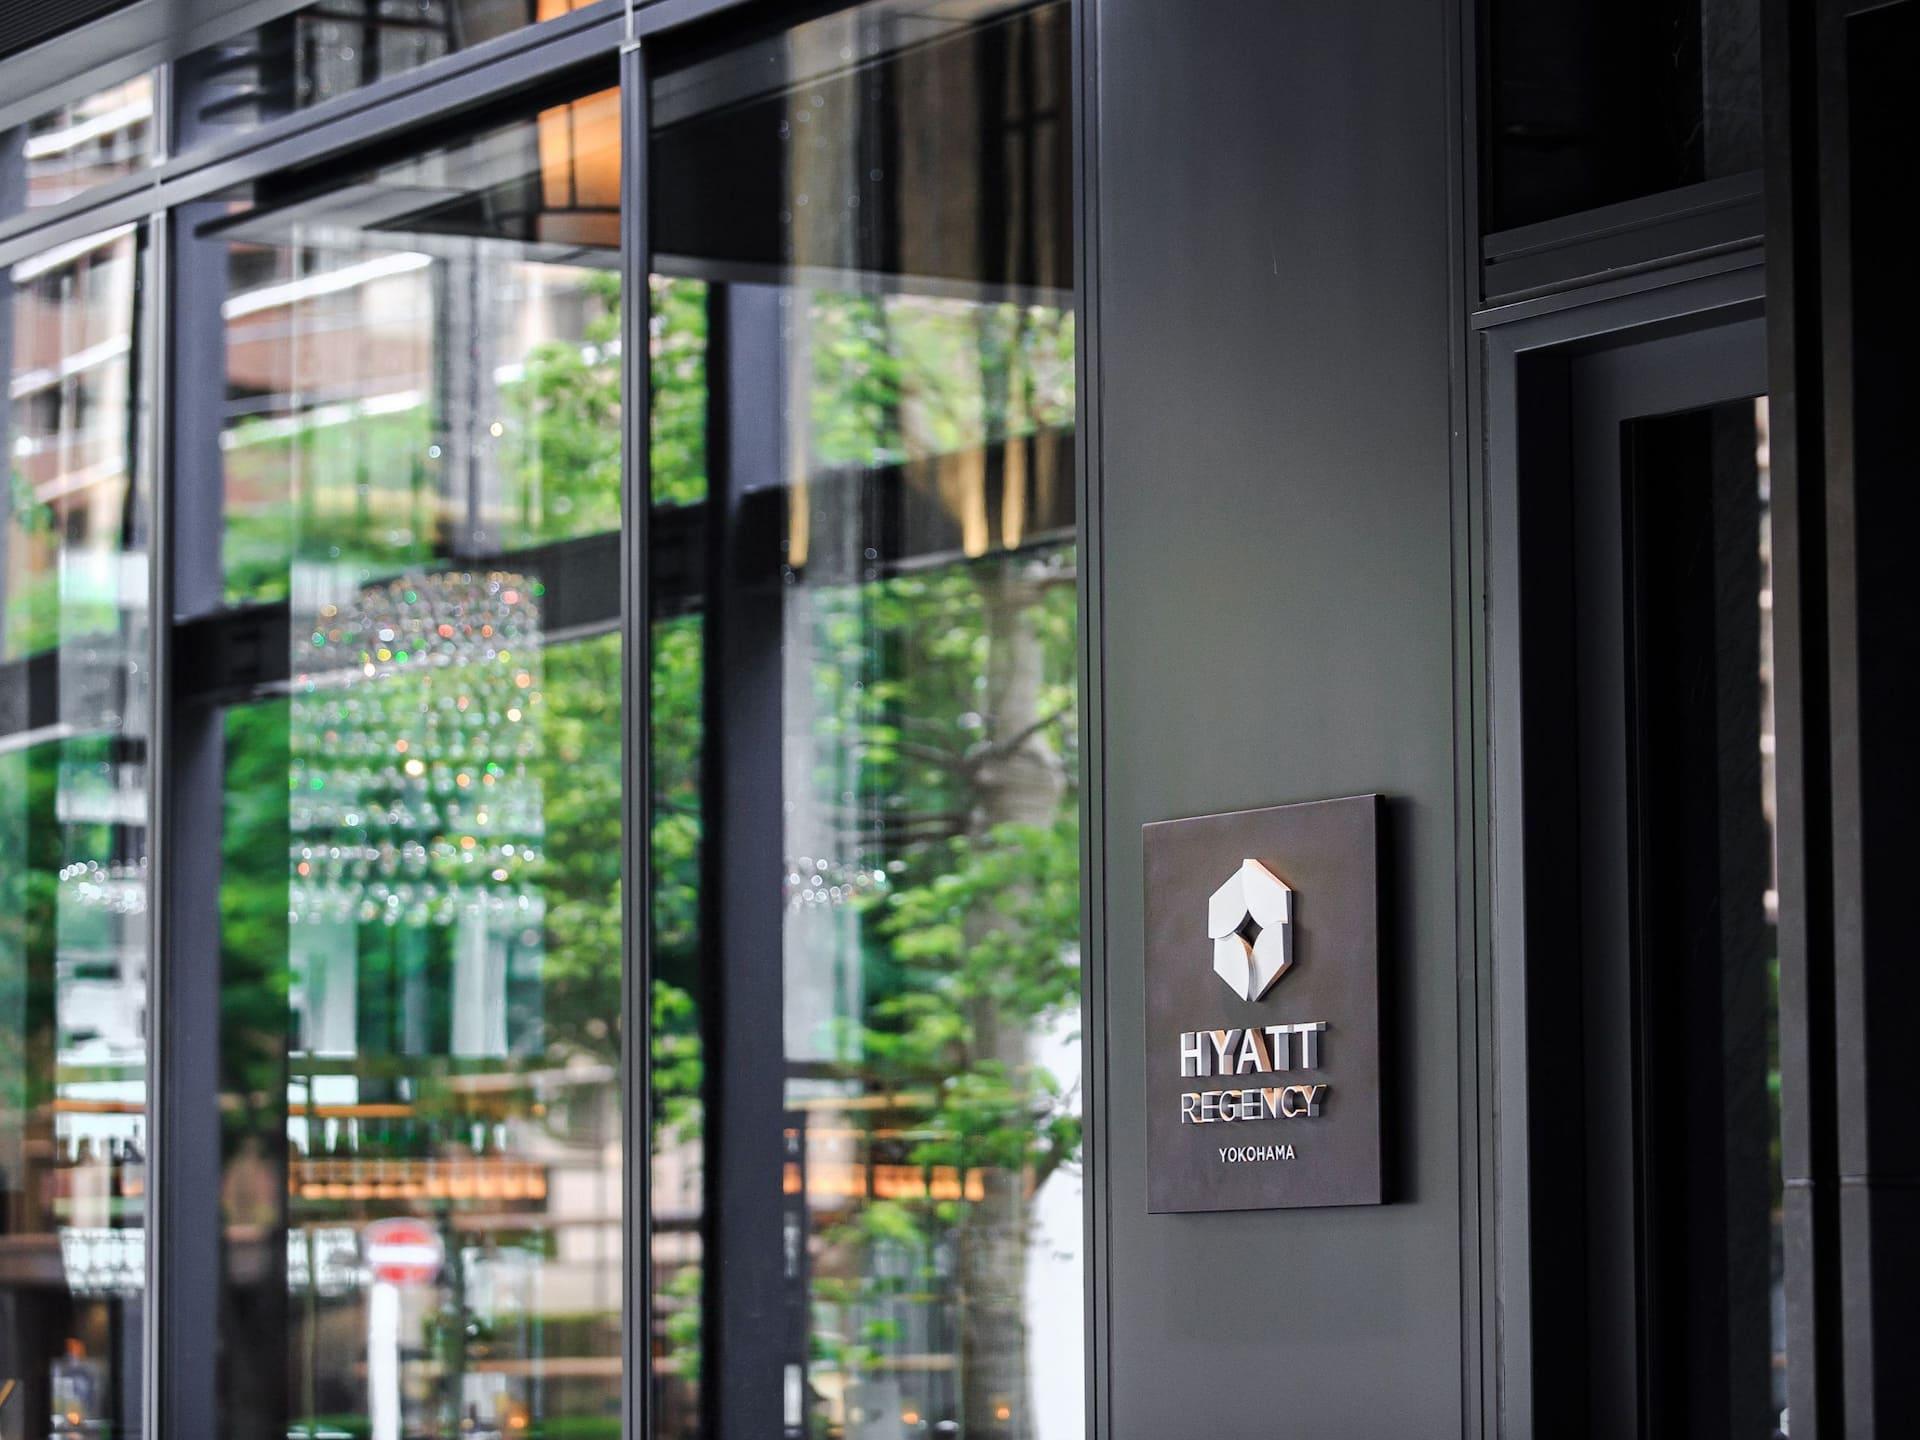 Hyatt Regency Yokohama | News & Events